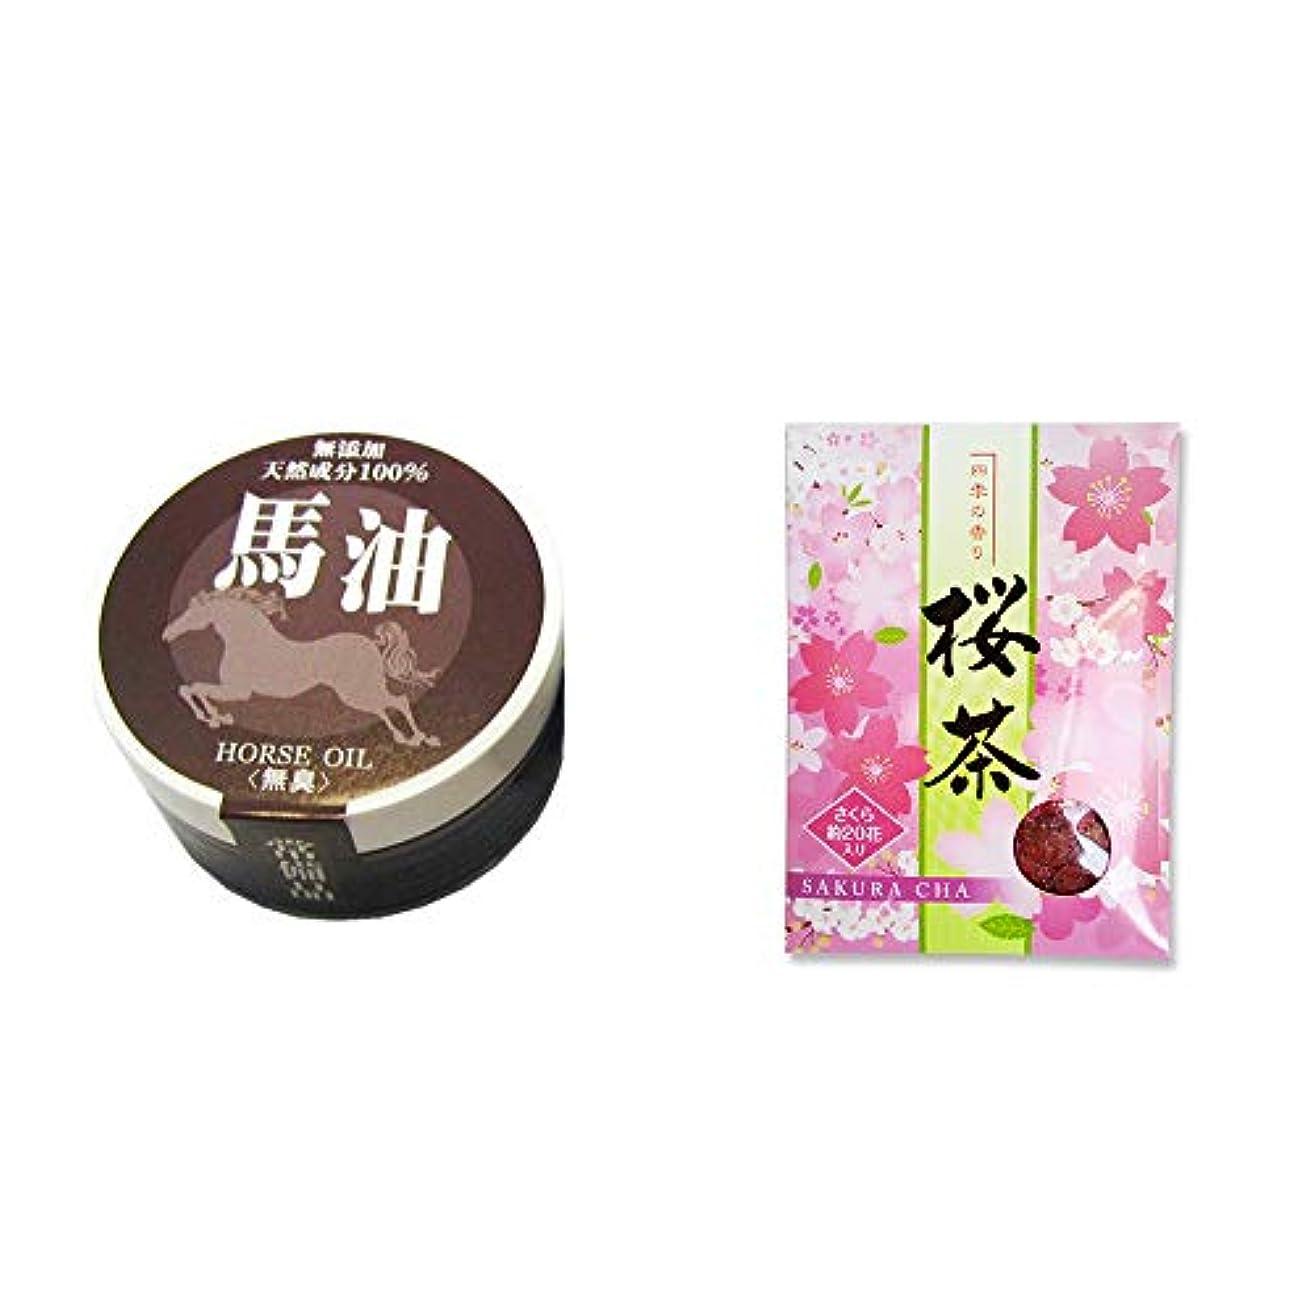 良い消防士千[2点セット] 無添加天然成分100% 馬油[無香料](38g)?桜茶(40g)